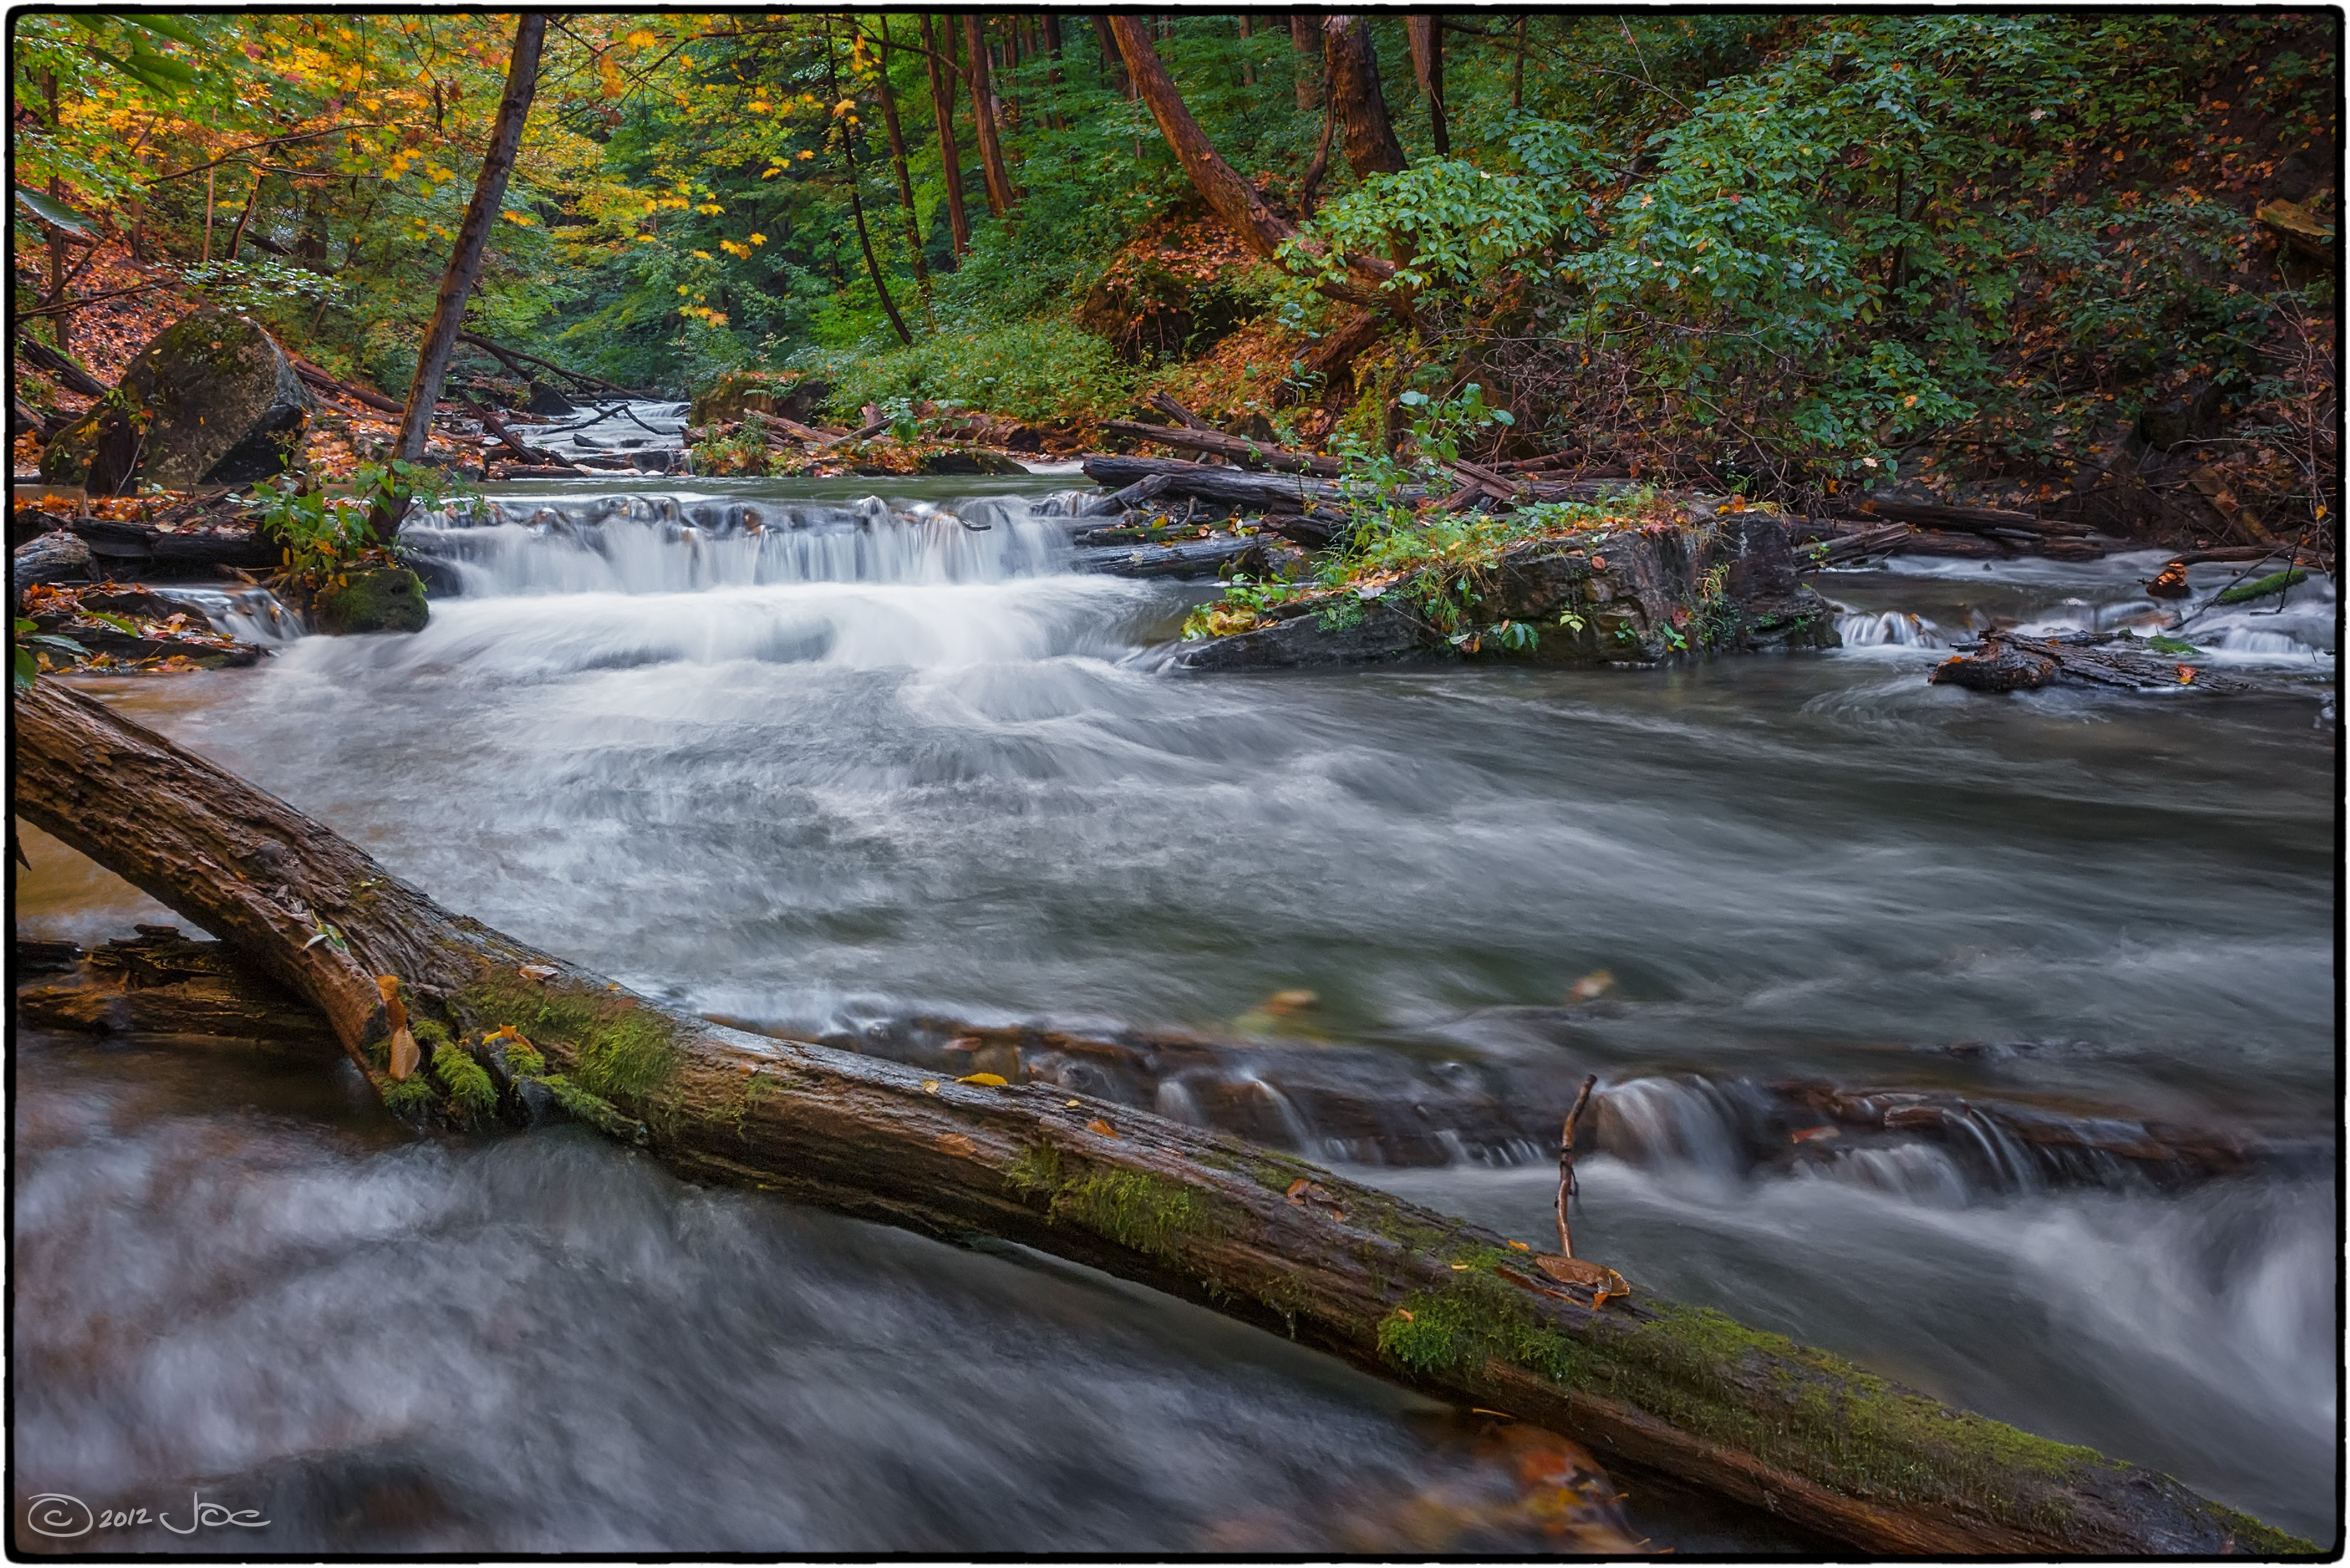 Beaverdams creek, st. catharines ontario photo